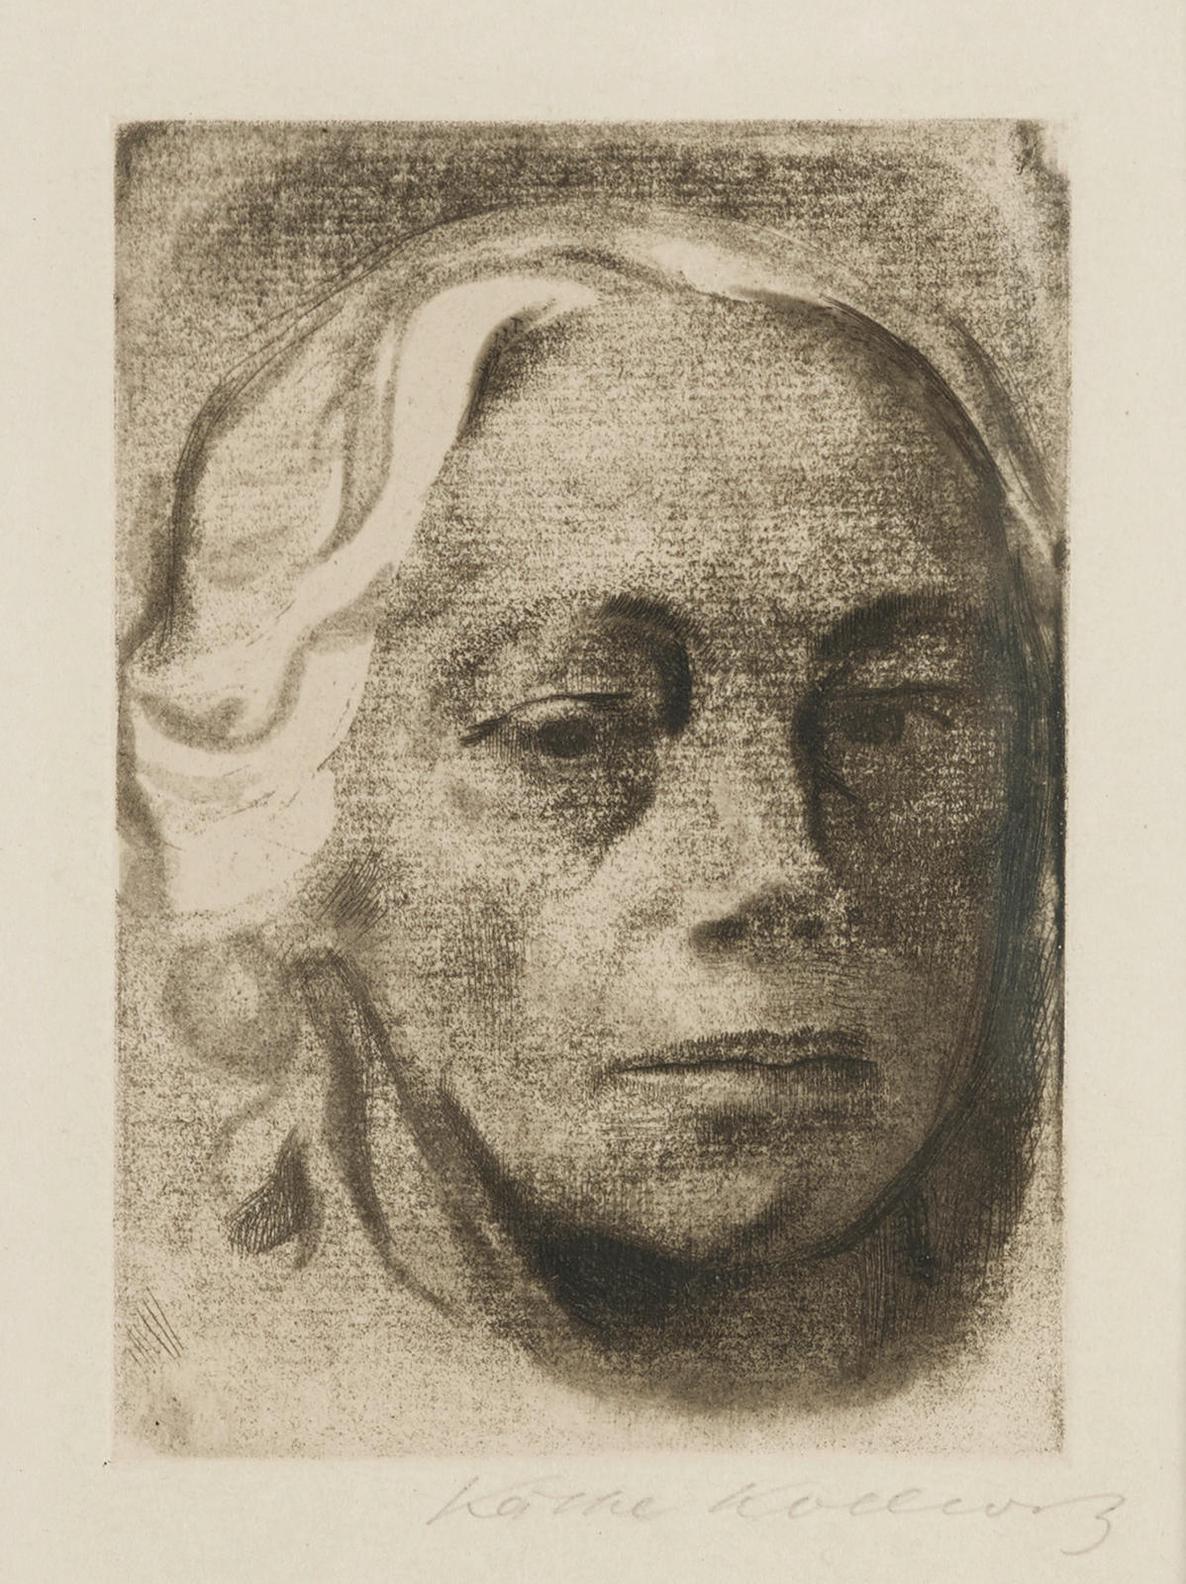 Kathe Kollwitz-Selbstbildnis (K. 122; Kn. 126 VII C), 1912-1912